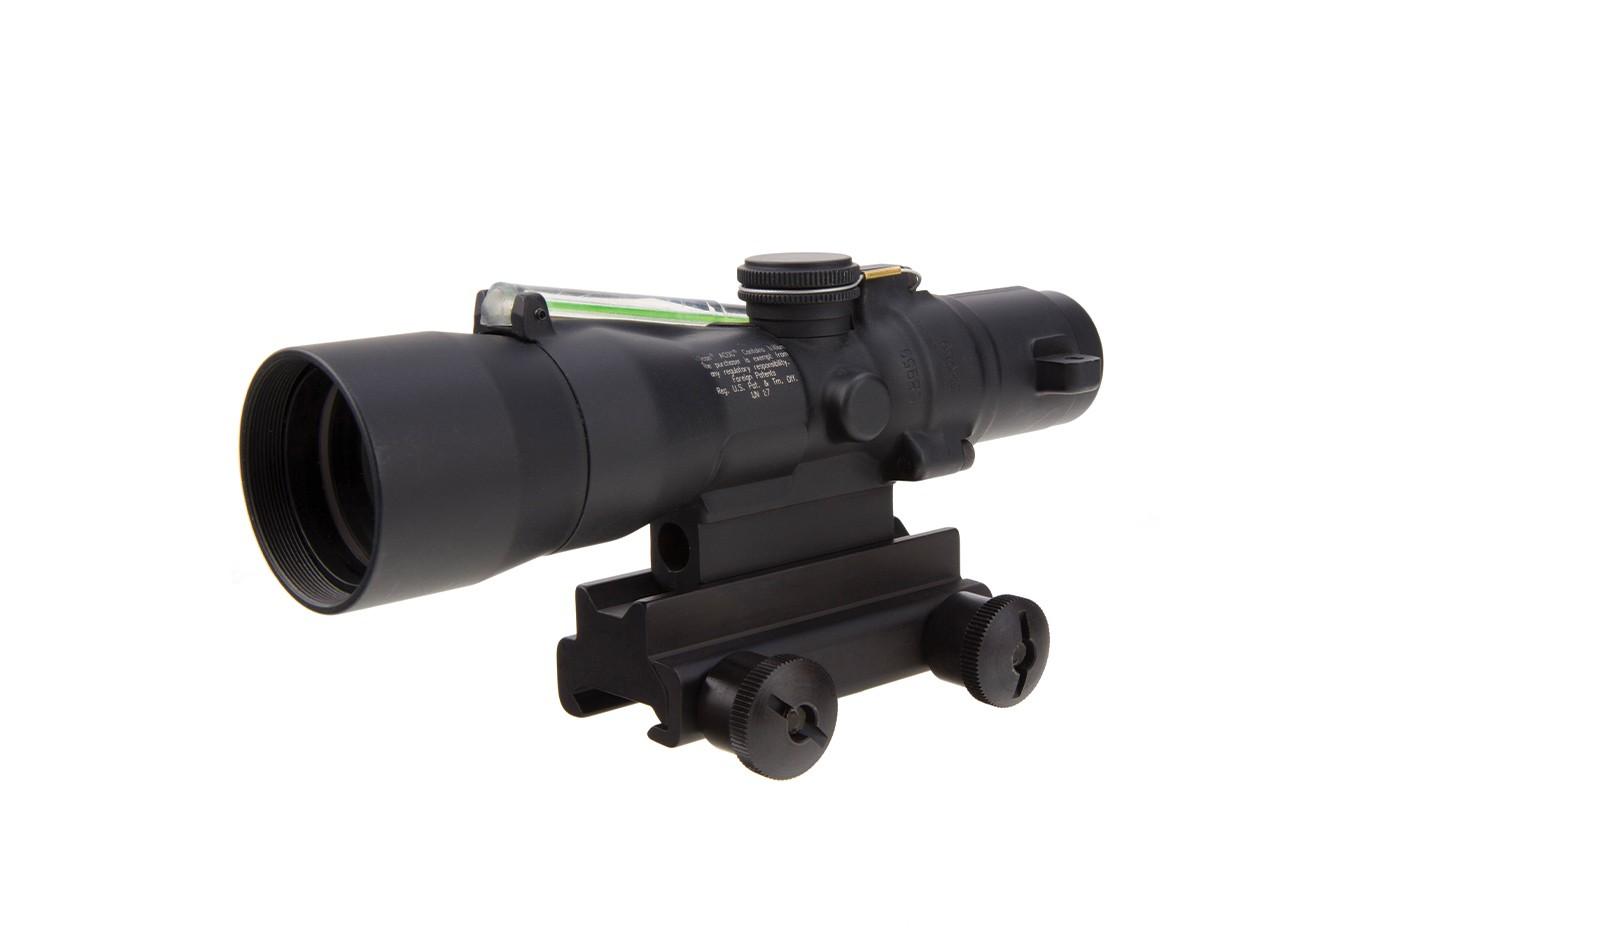 Trijicon ACOG® BAC 3x30 Riflescope - 5.56x45mm / 62 Grain